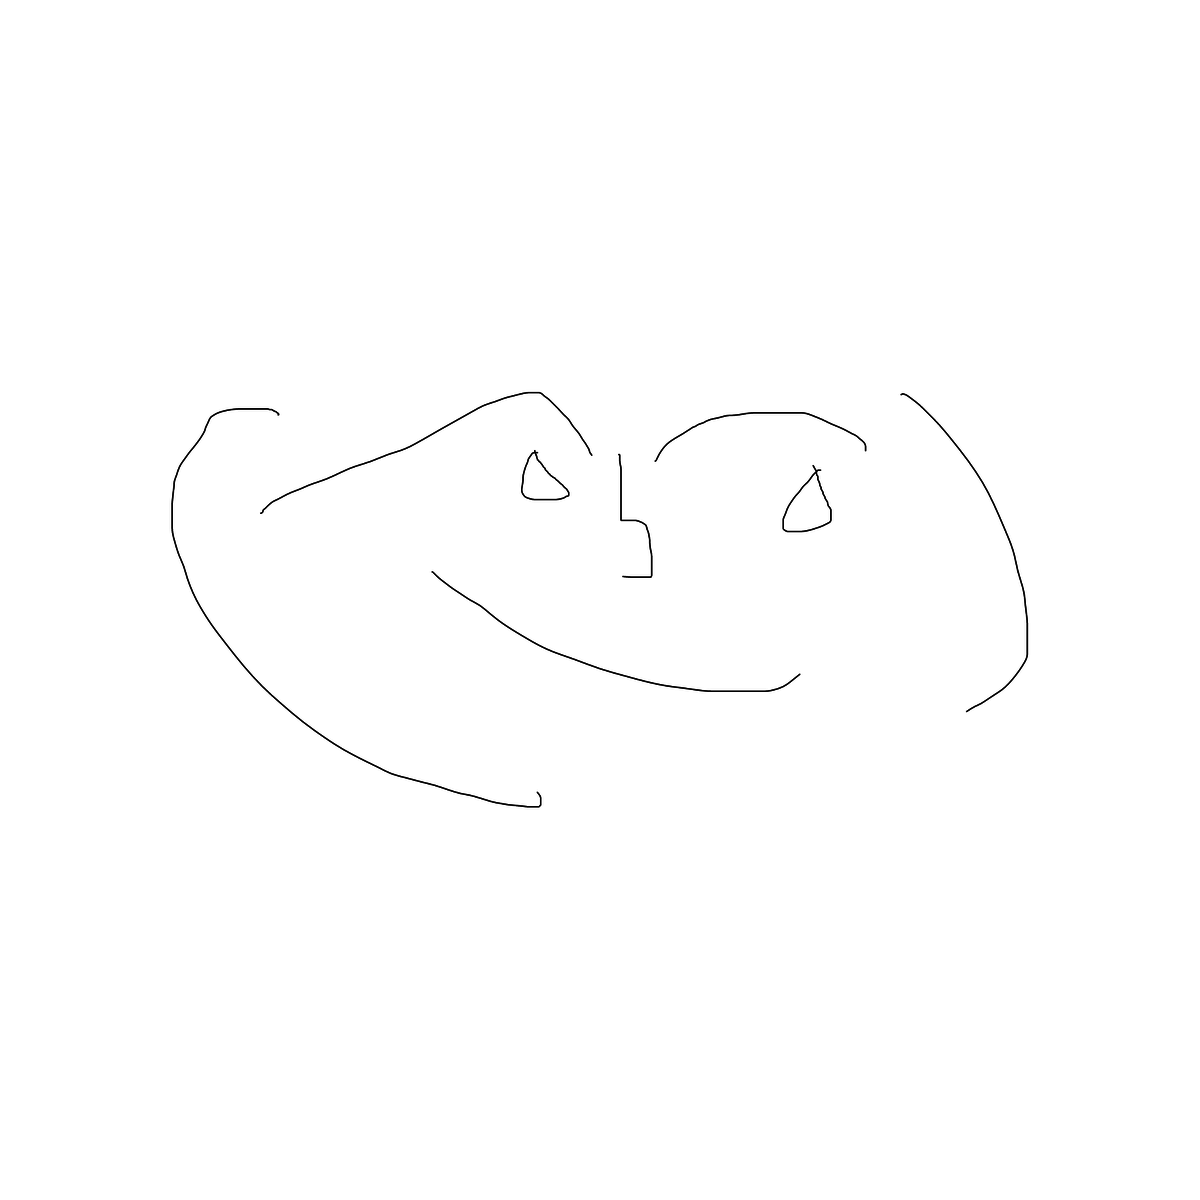 BAAAM drawing#22507 lat:39.5163154602050800lng: -76.9382629394531200